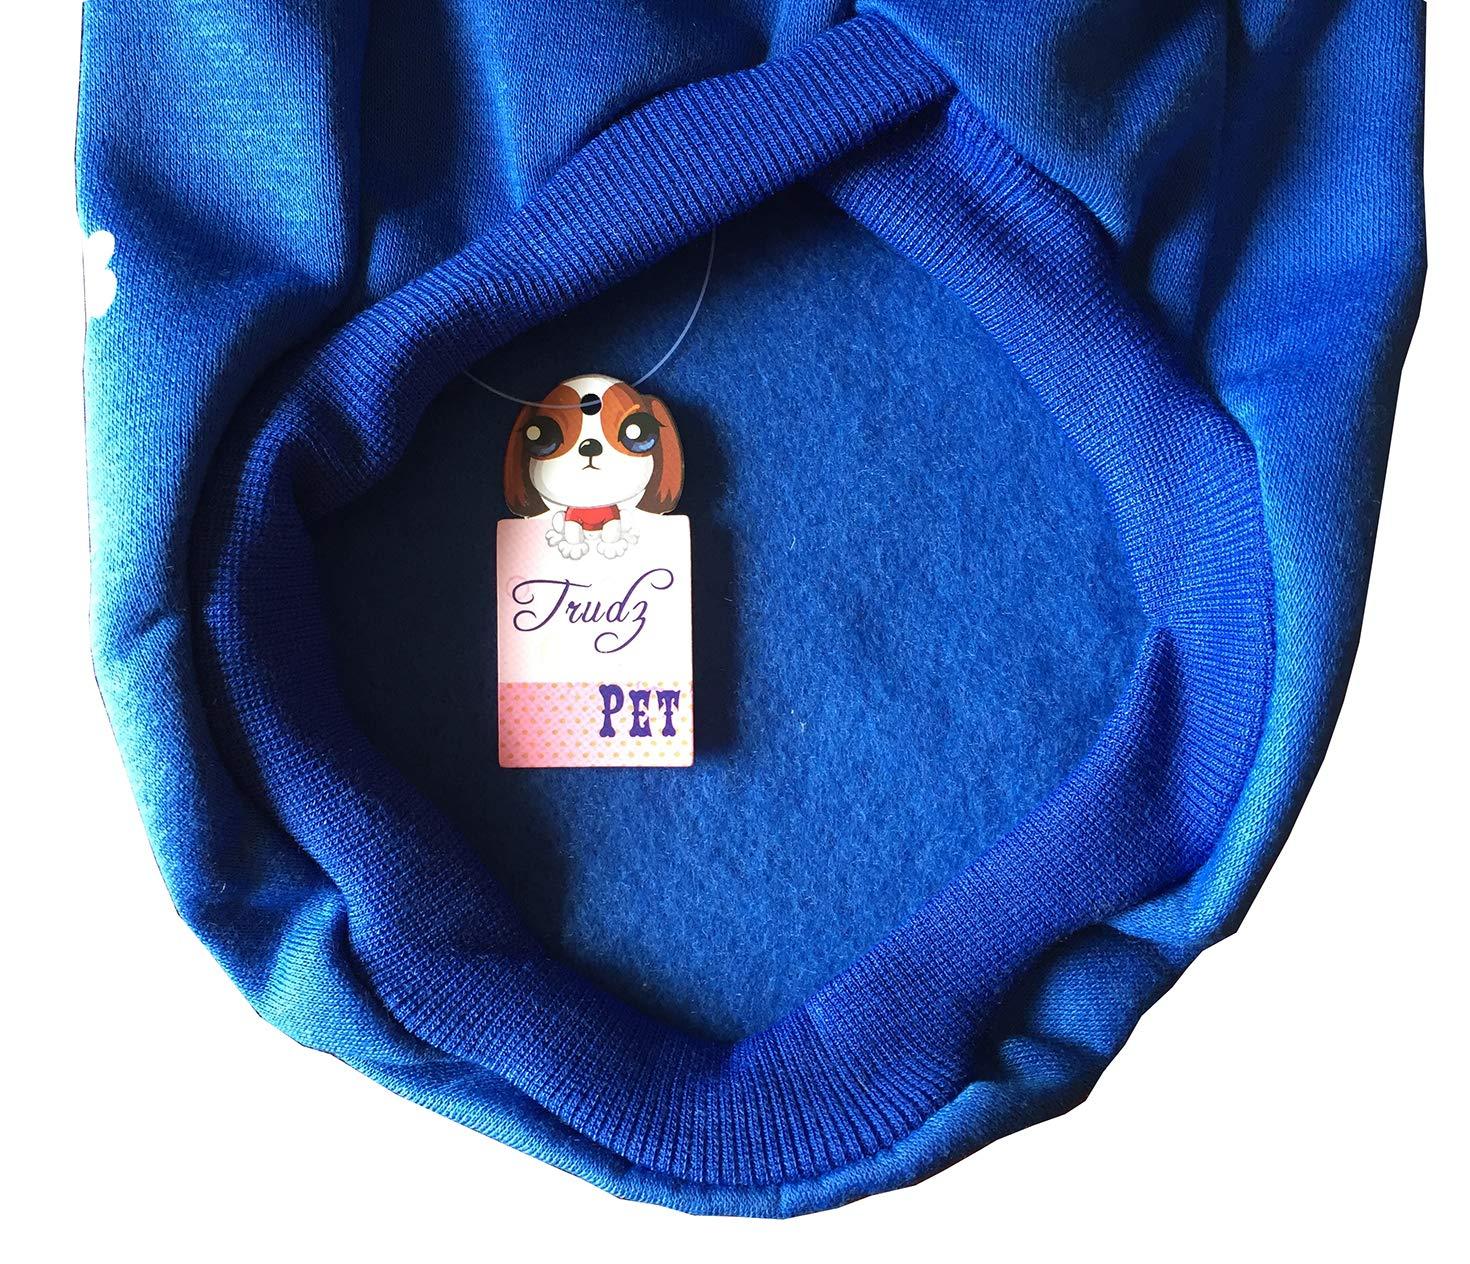 Cotton Jacket Sweat shirt Coat for Small Dog /& Medium Dog /& Cat Fleece Basic Hoodie Sweater Apparel Rdc Pet Adidog Dog Hoodies Navy Blue,S